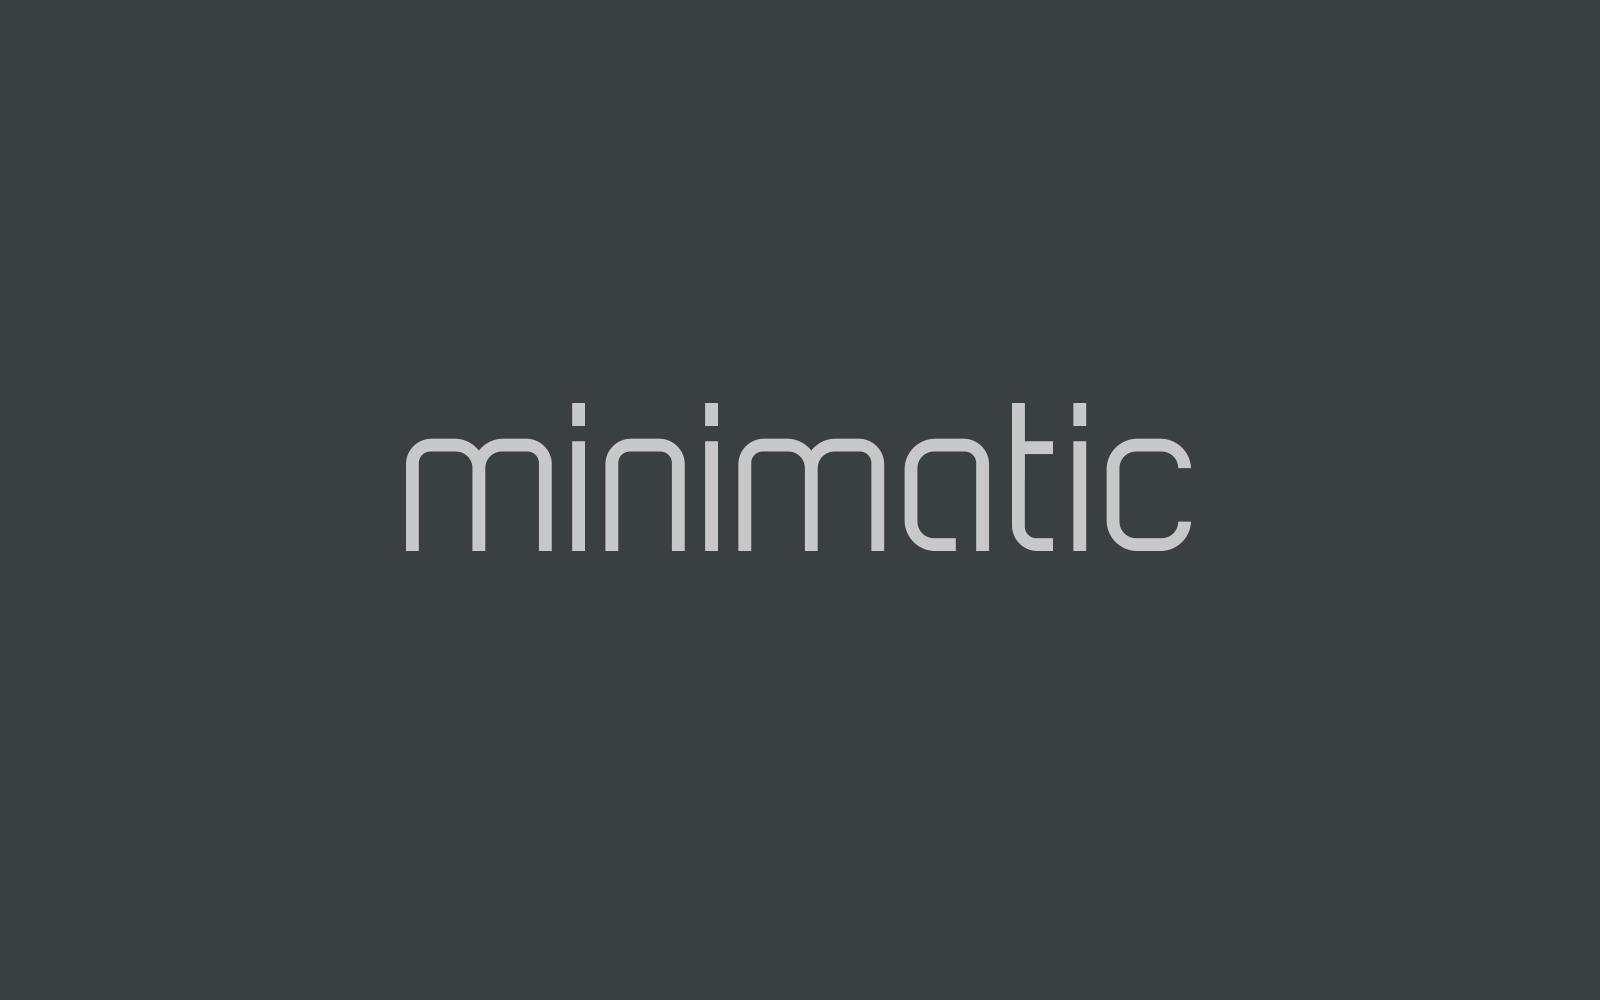 logo_1600p_minimatic